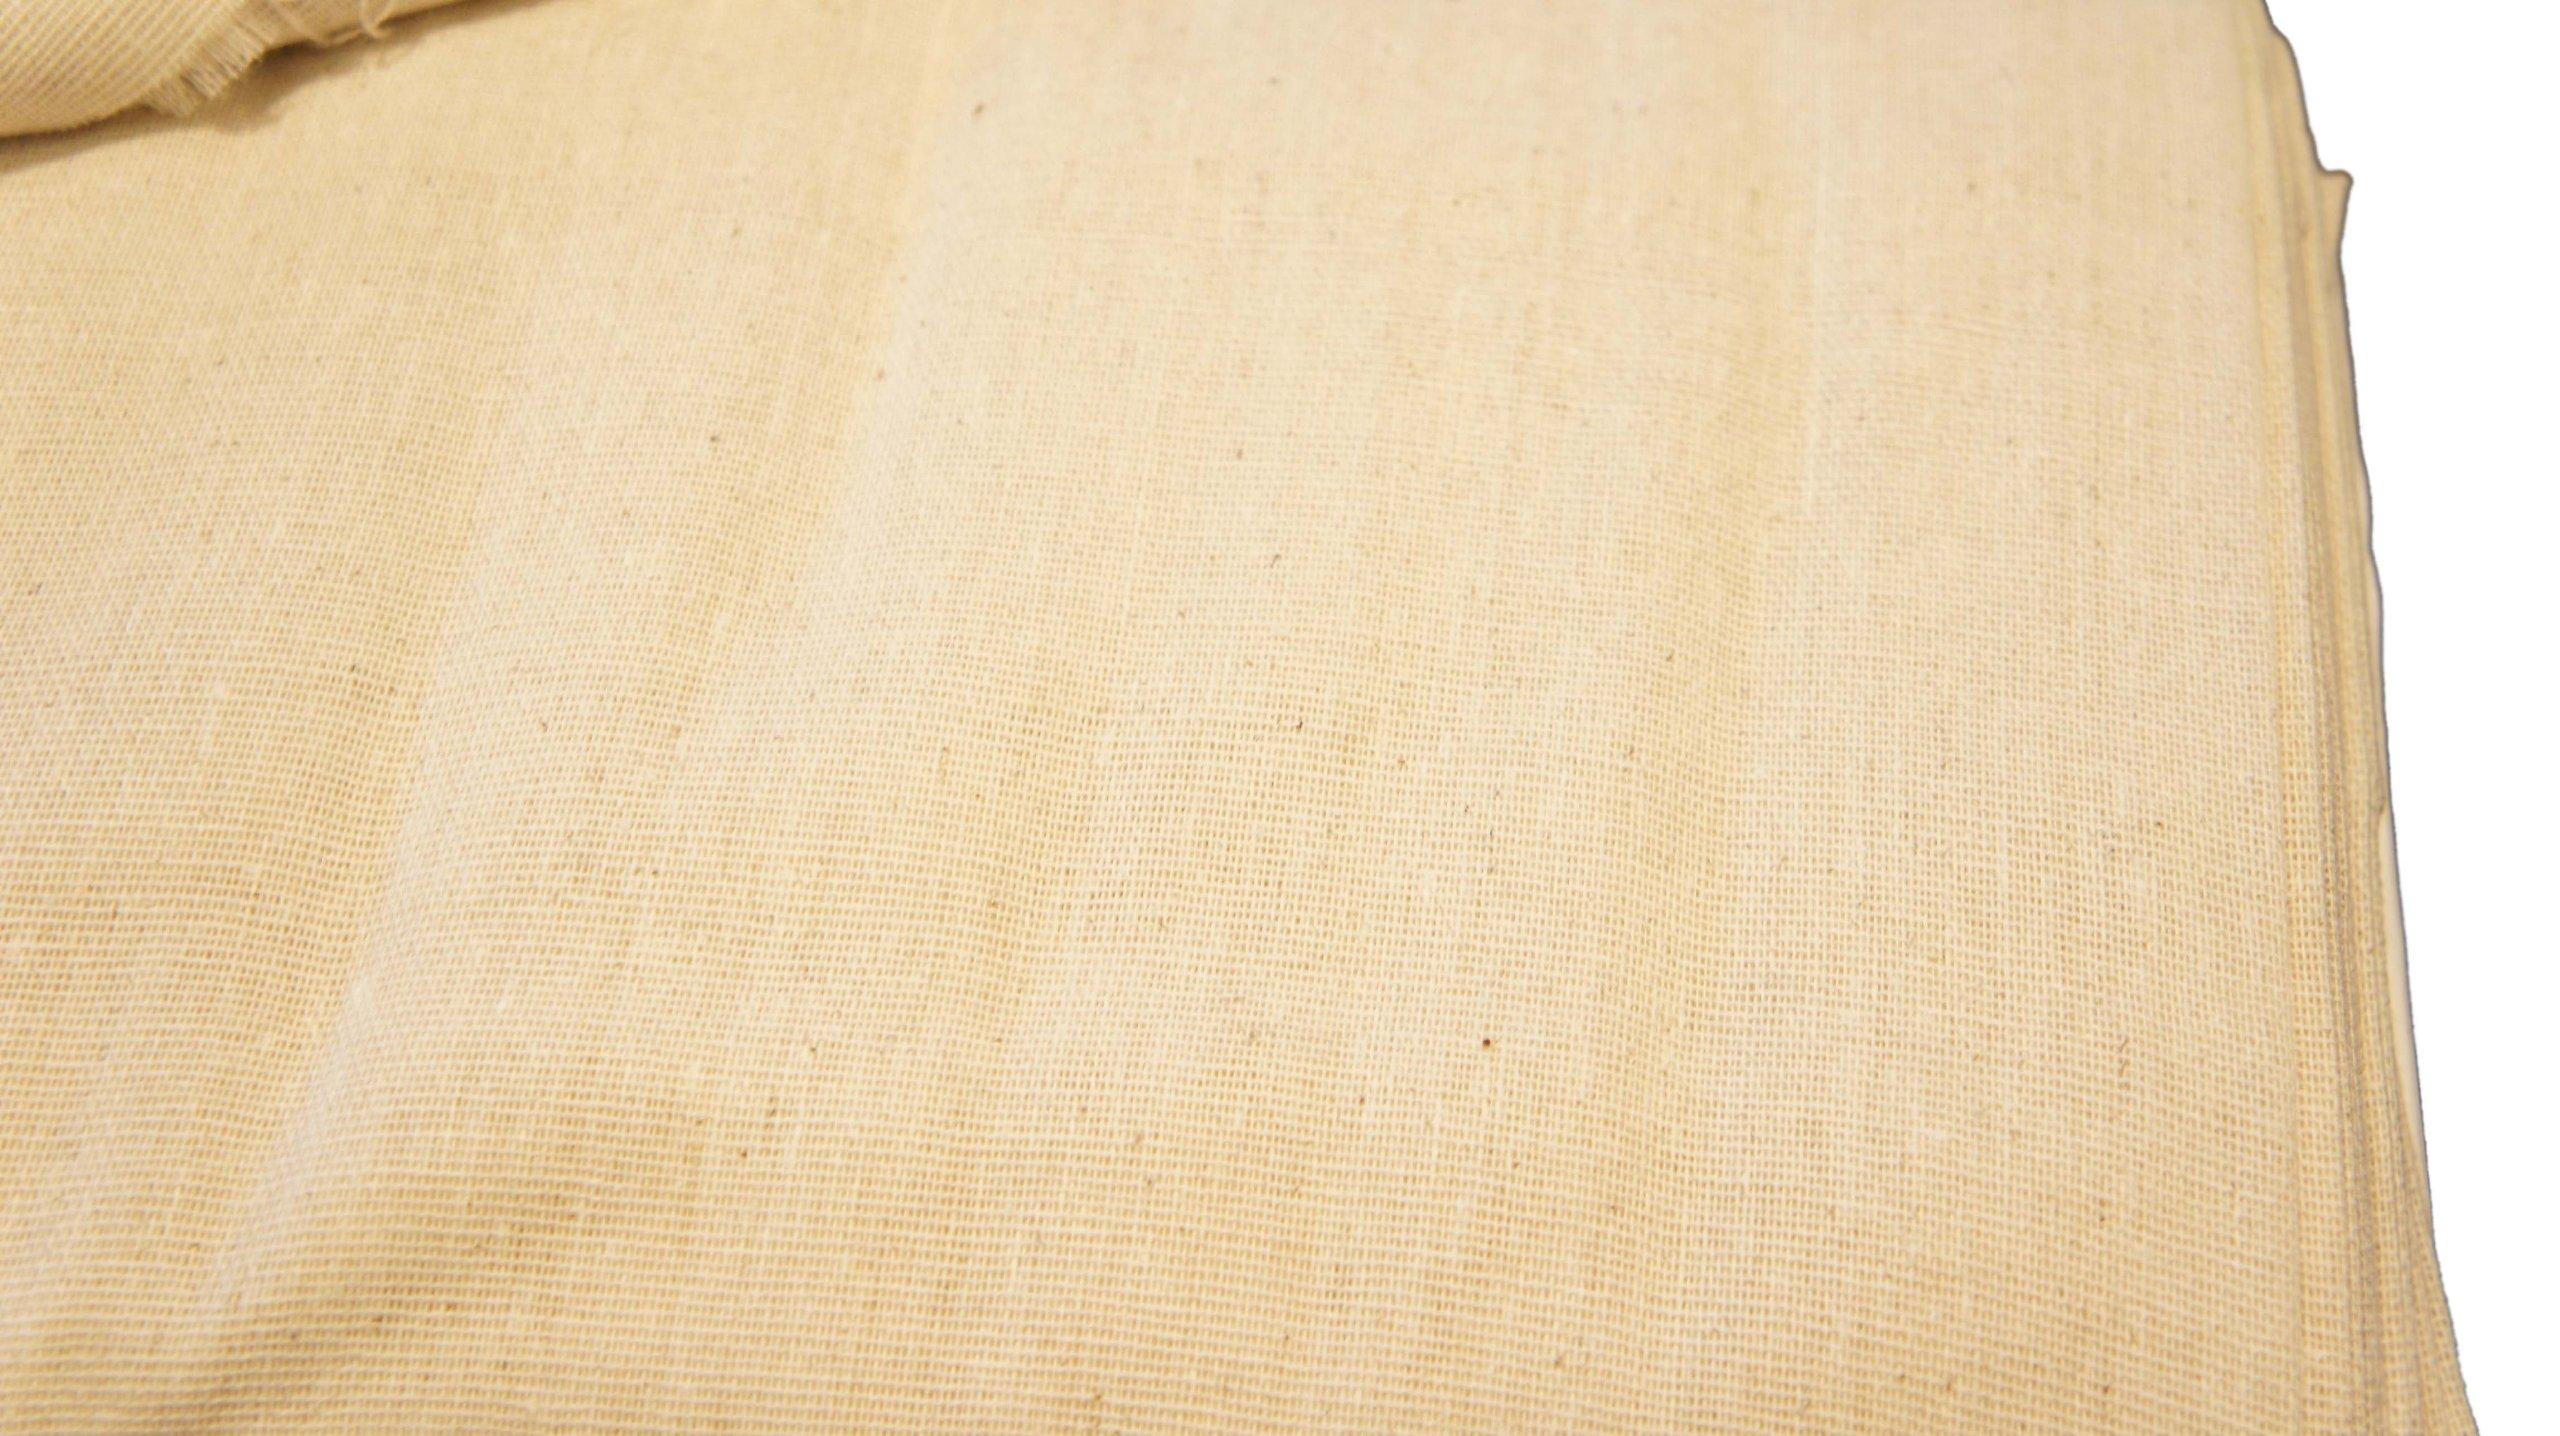 Unbleached Osnaburg 45'' 100% Cotton 25yd Bolt-Natural by Roc-lon (Image #3)